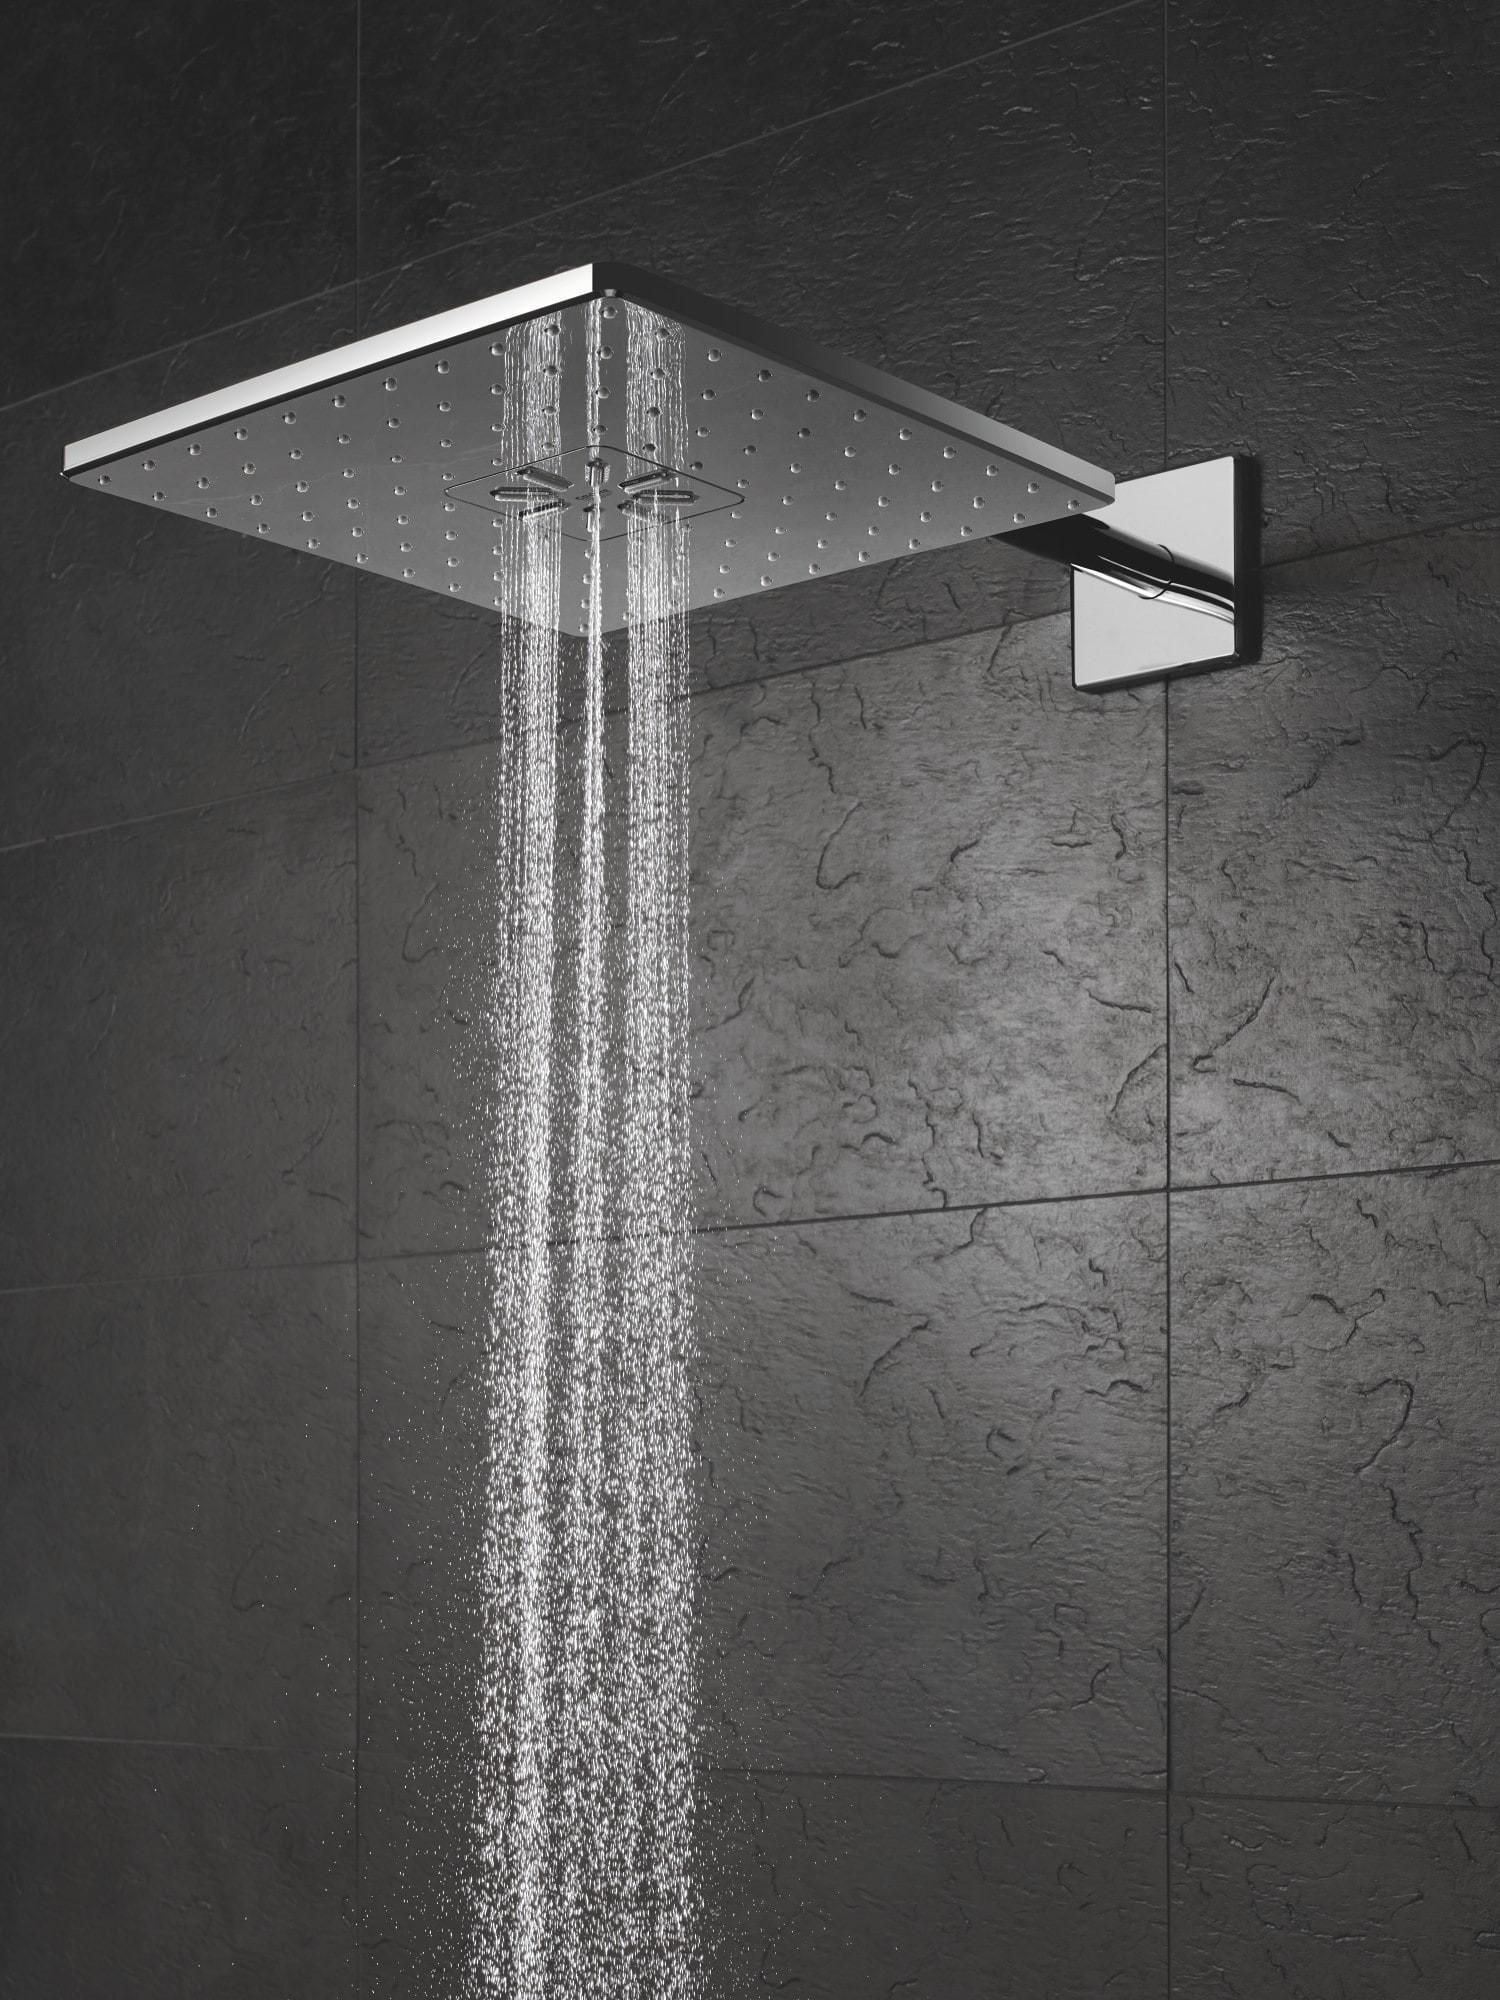 grohe rainshower cosmopolitan kopfbrause set rainshower 310 smart active cube xtwostore. Black Bedroom Furniture Sets. Home Design Ideas